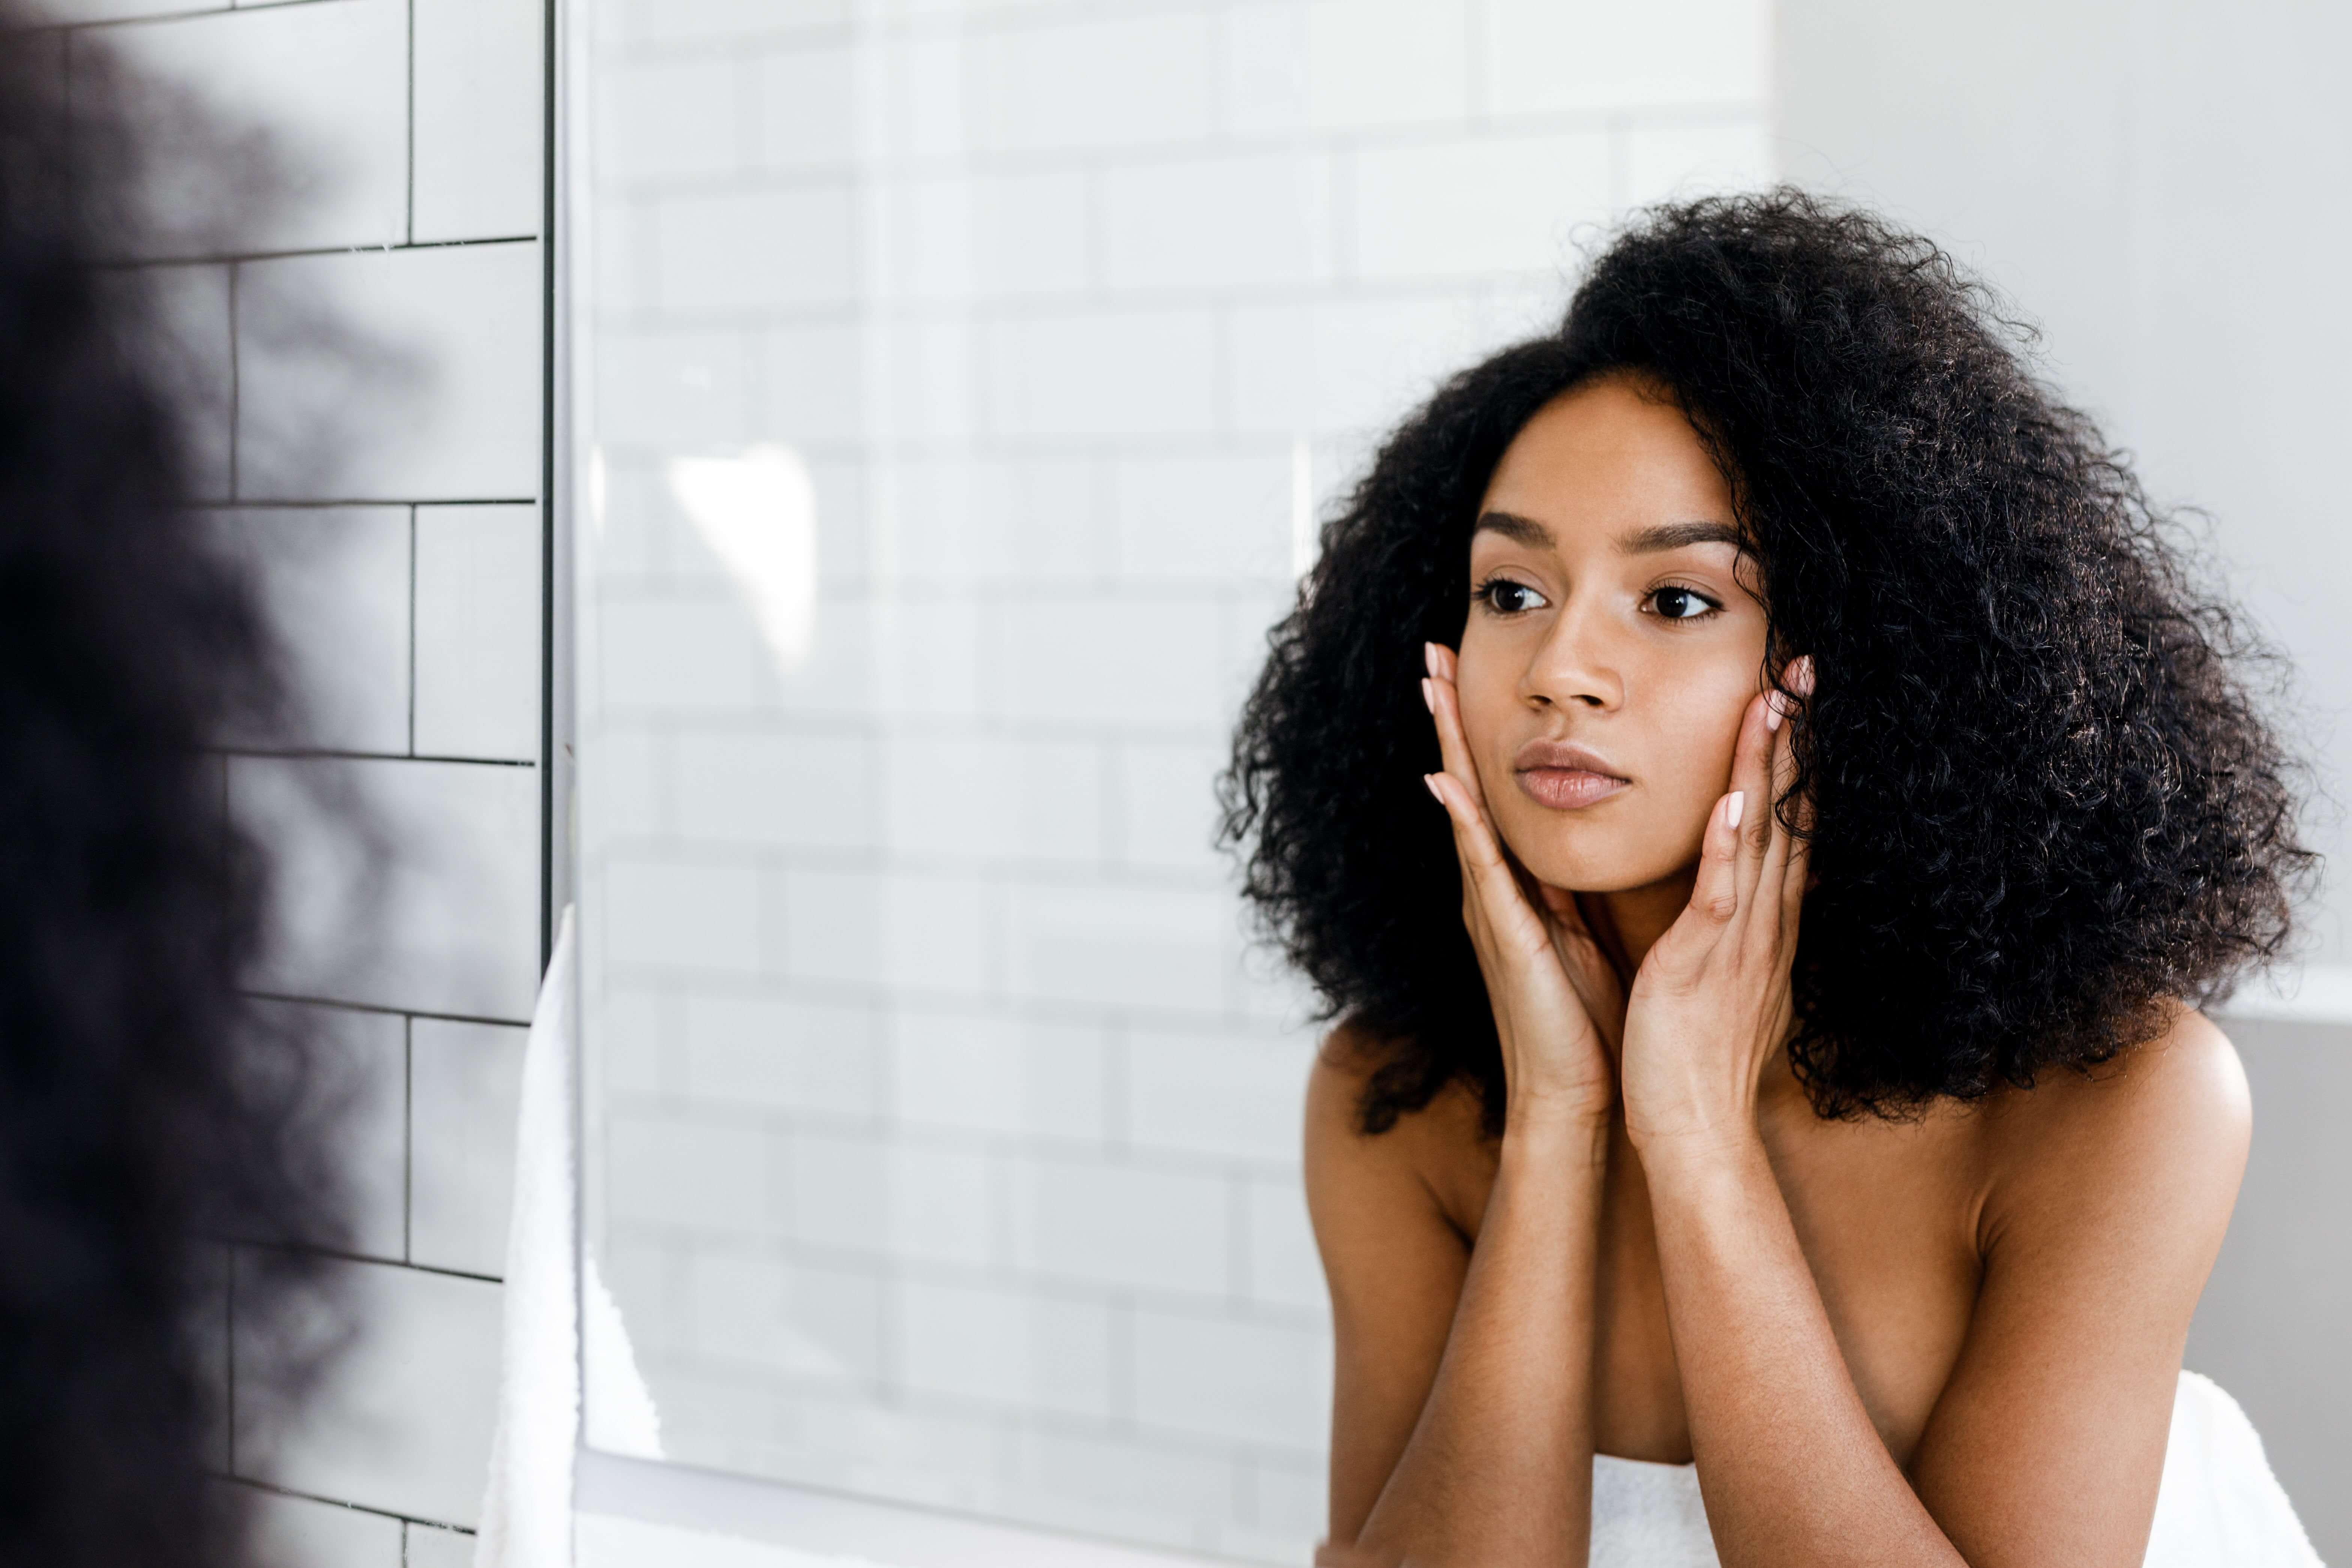 Girl Looking into Mirror